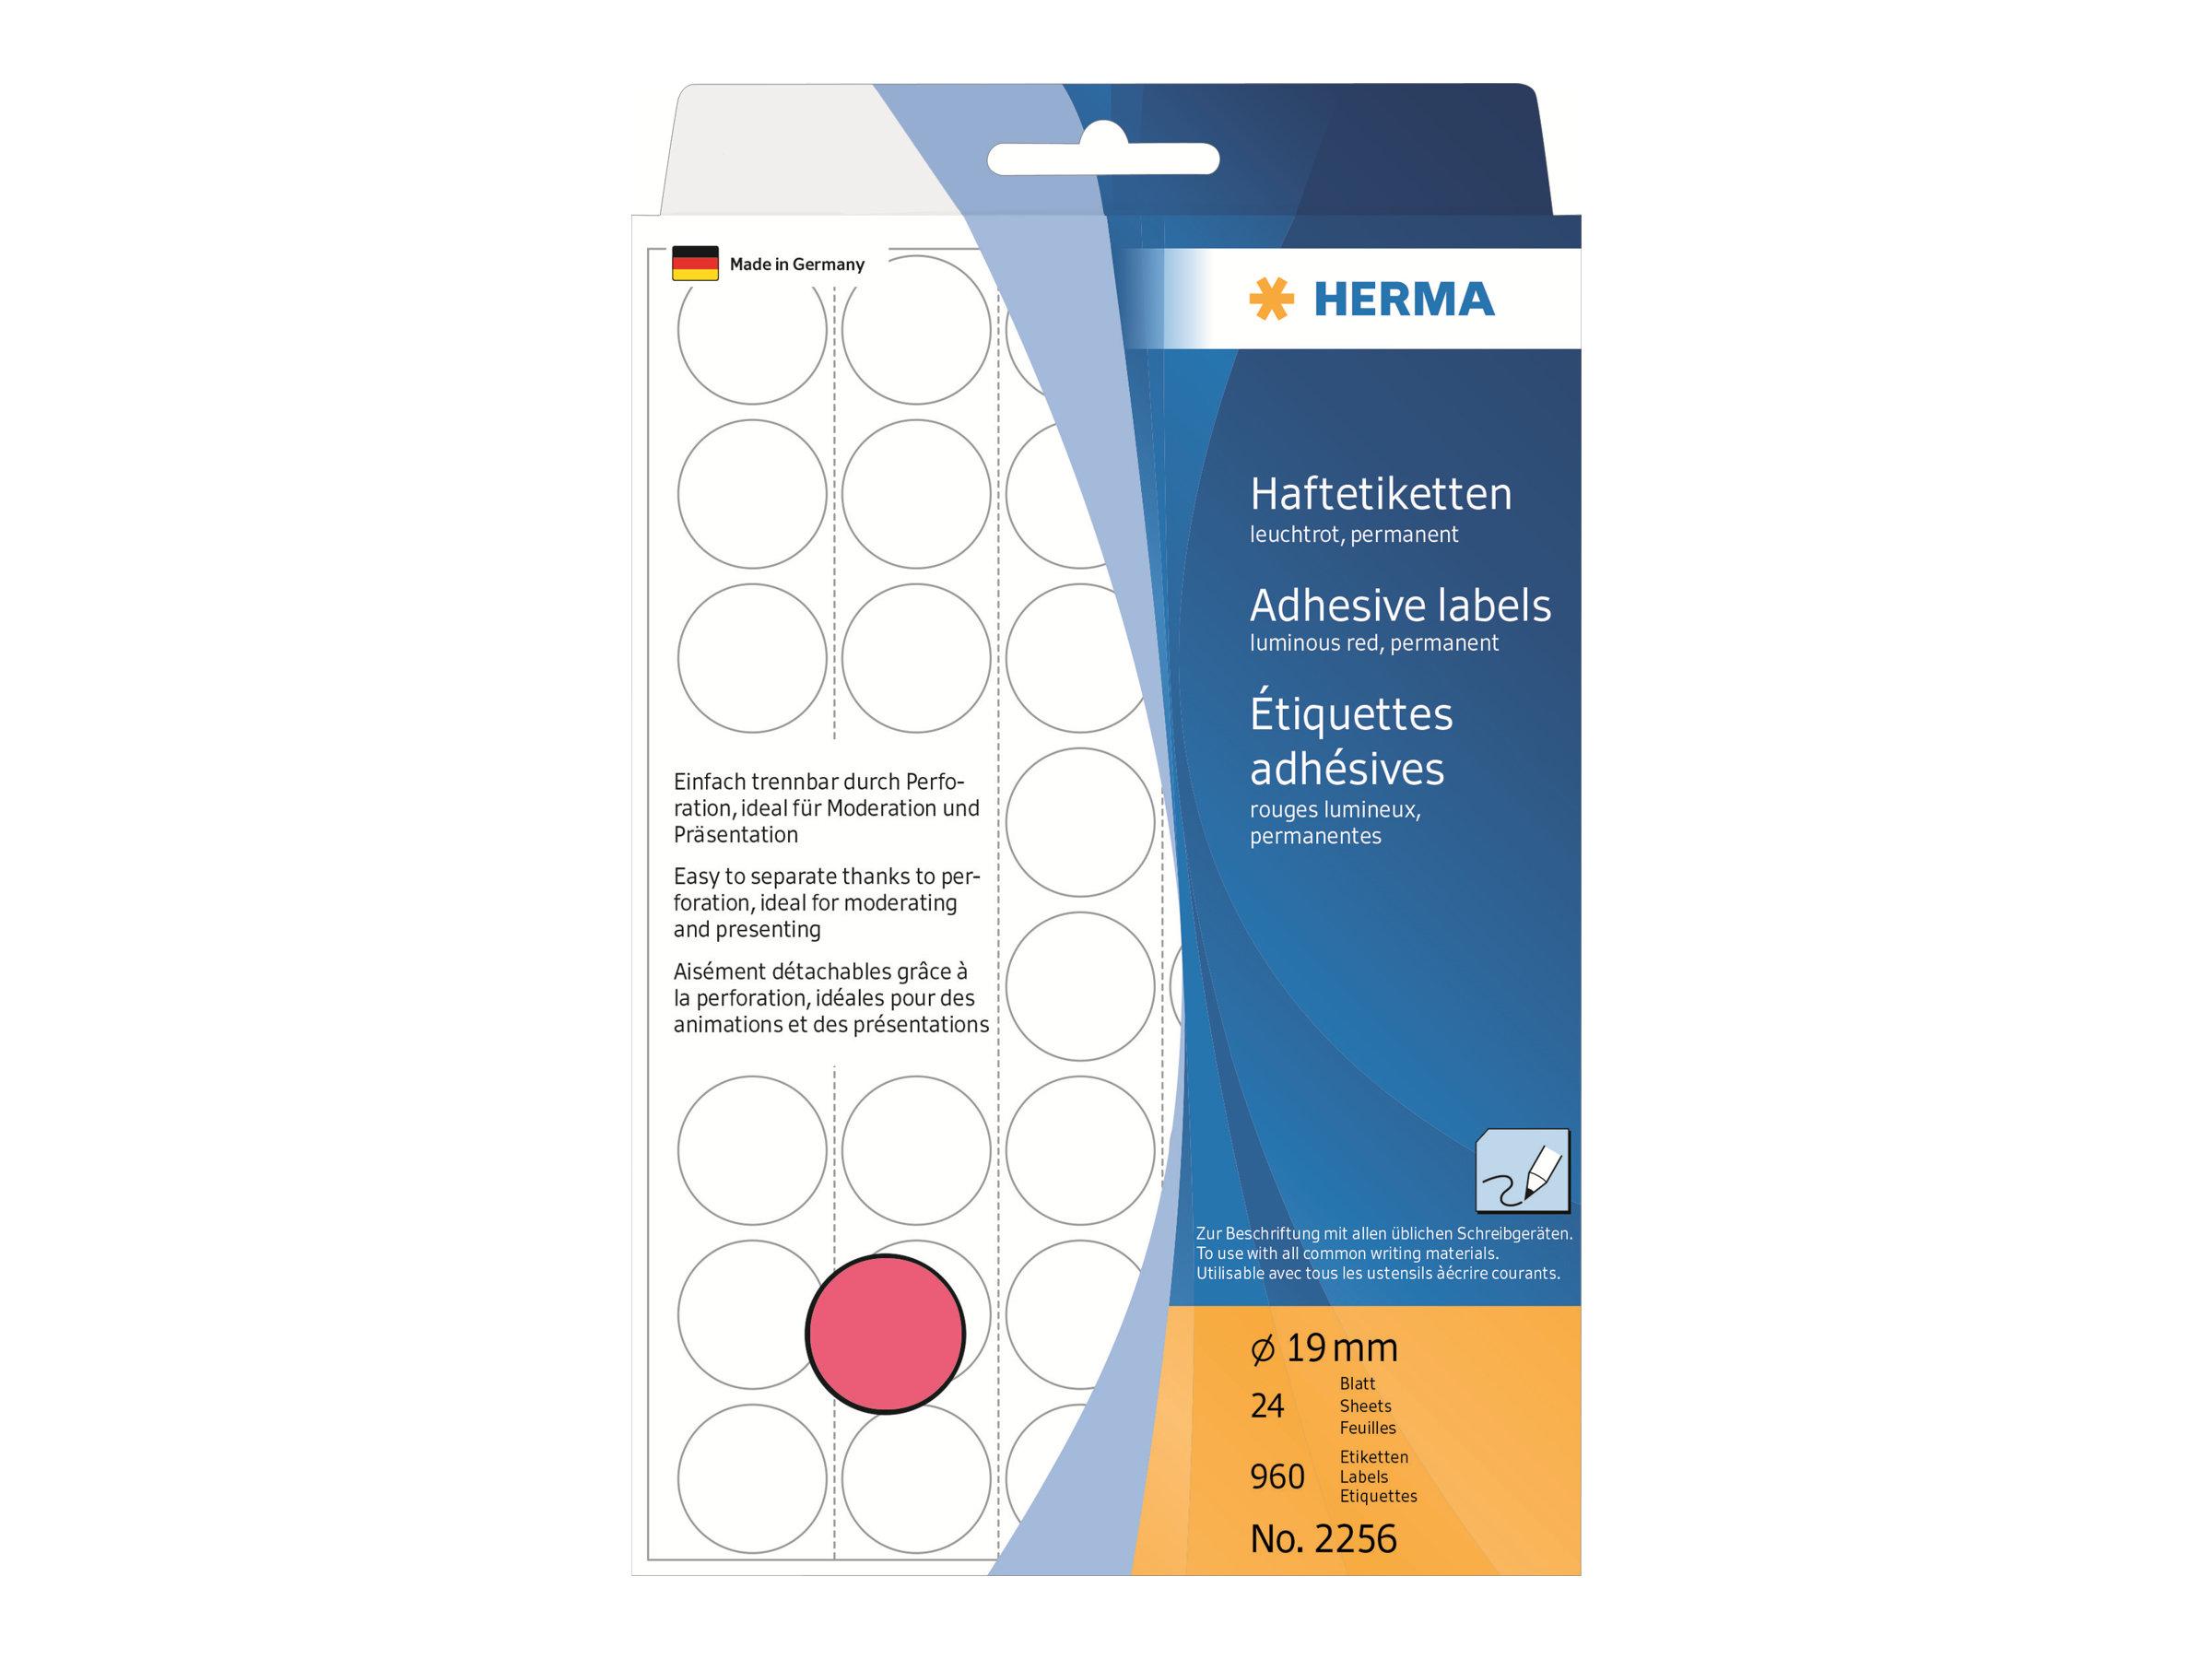 HERMA Permanenter Klebstoff - Luminous Red - 19 mm rund 960 Etikett(en) (24 Bogen x 40)